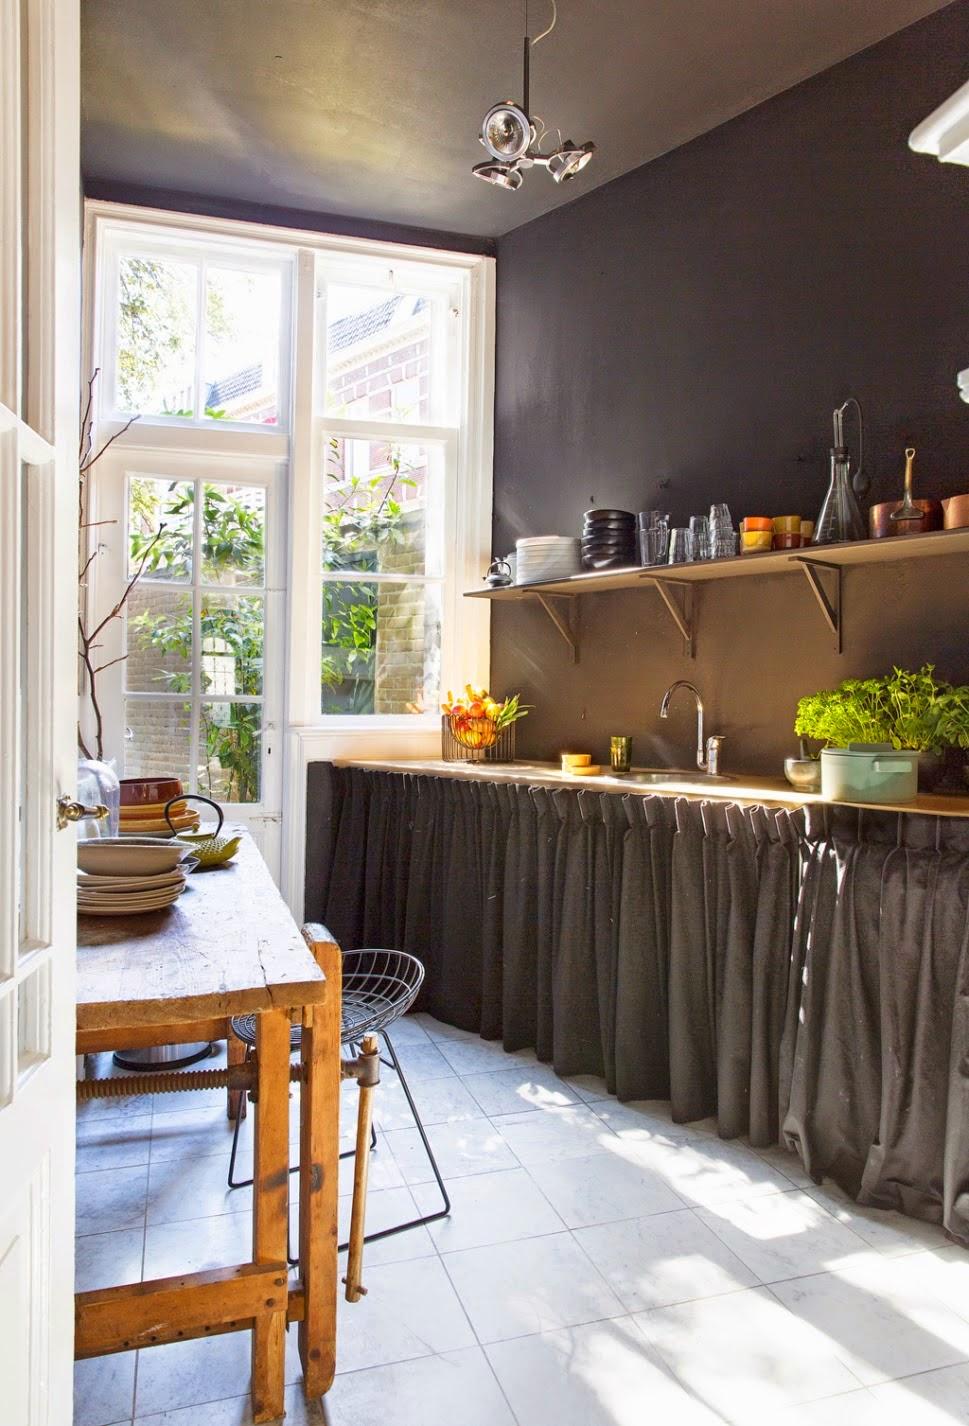 Carlota mam cocina r stica muy contempor nea for Cocinas contemporaneas 2015